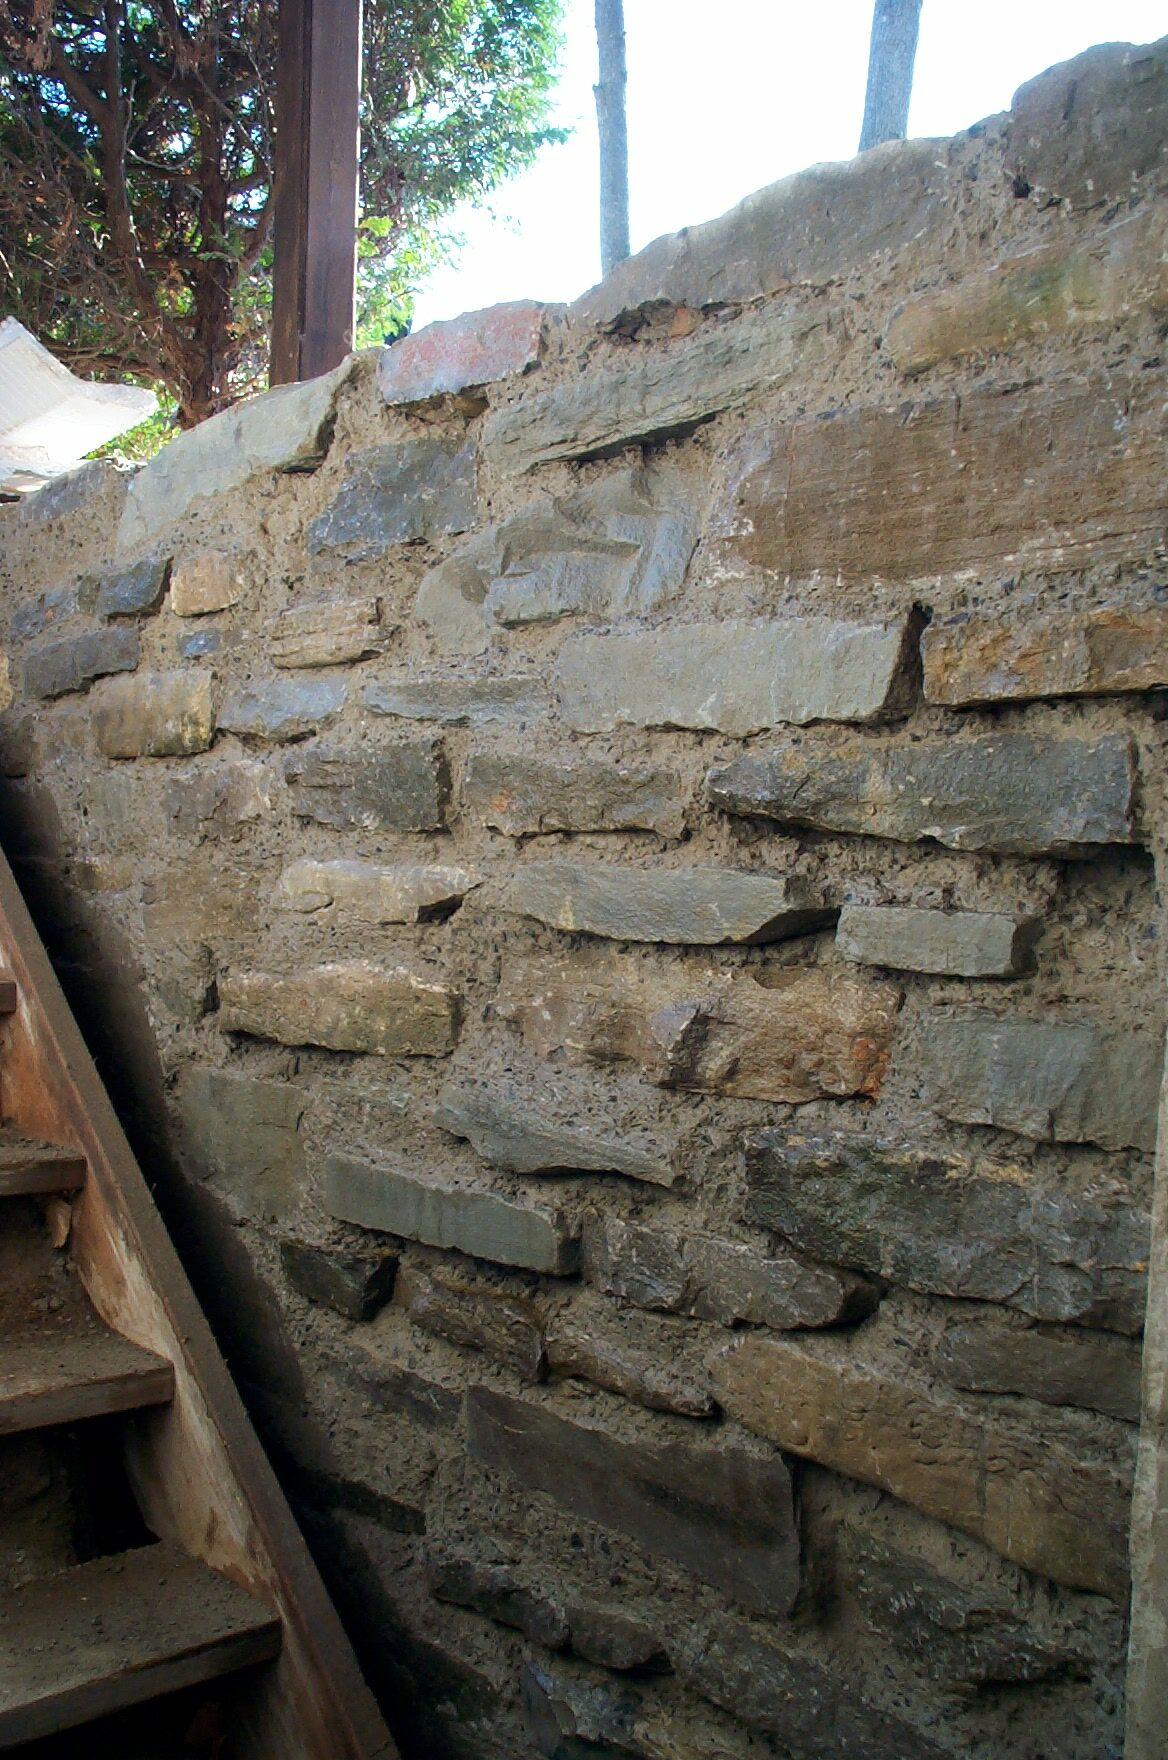 Slipform Stone Masonry : Slip form slipform masonry stone wall